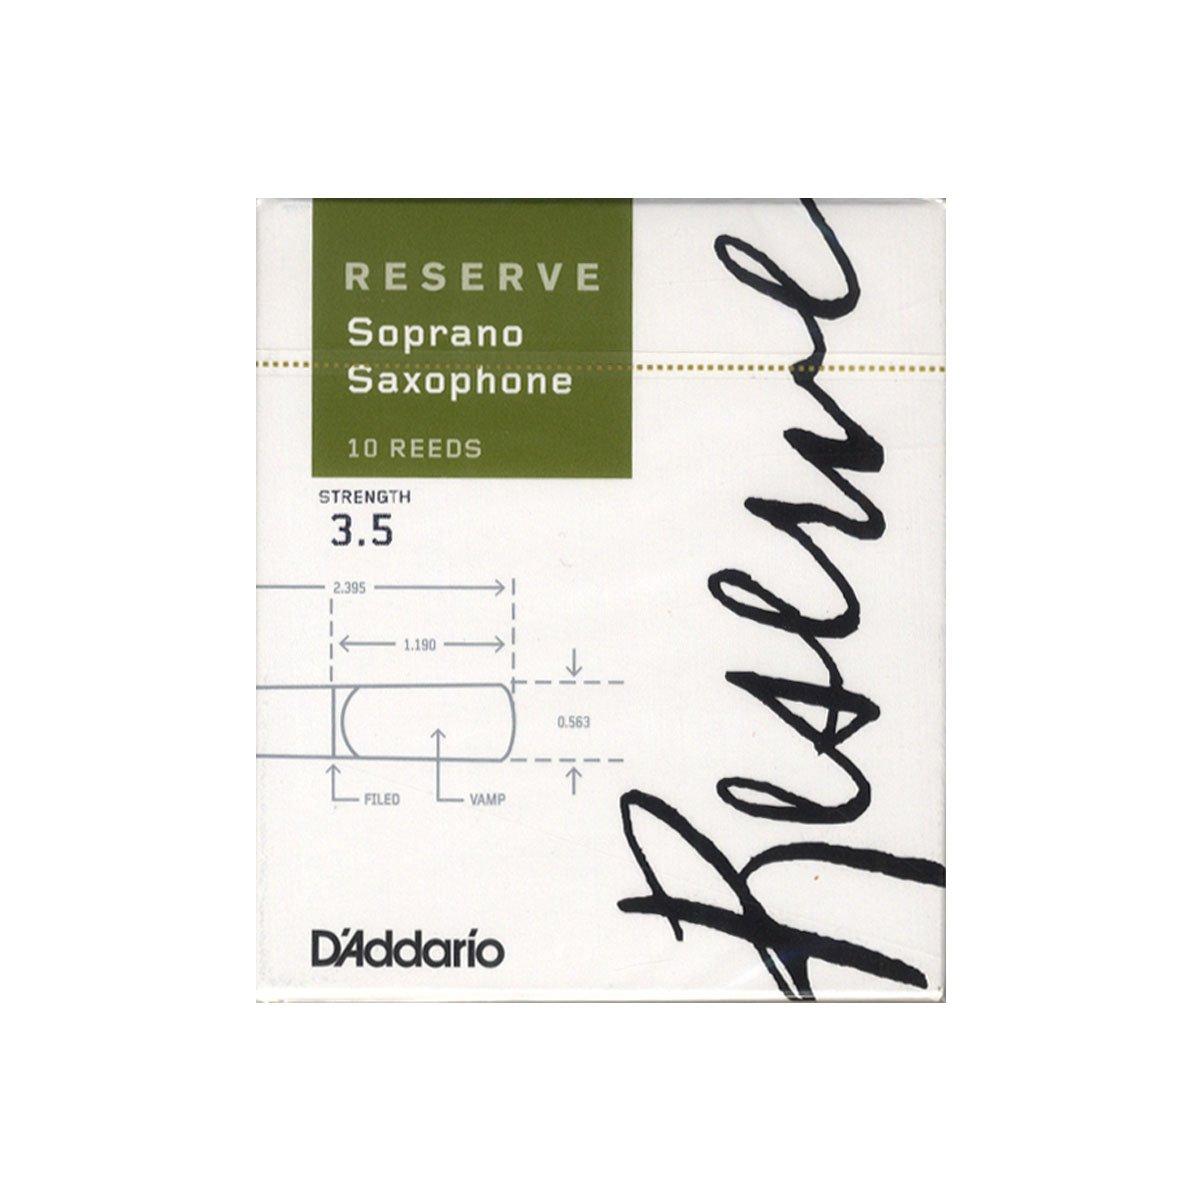 D'Addario Reserve Soprano Saxophone Reeds, Strength 2.5, 10-Pack D'Addario &Co. Inc DIR1025